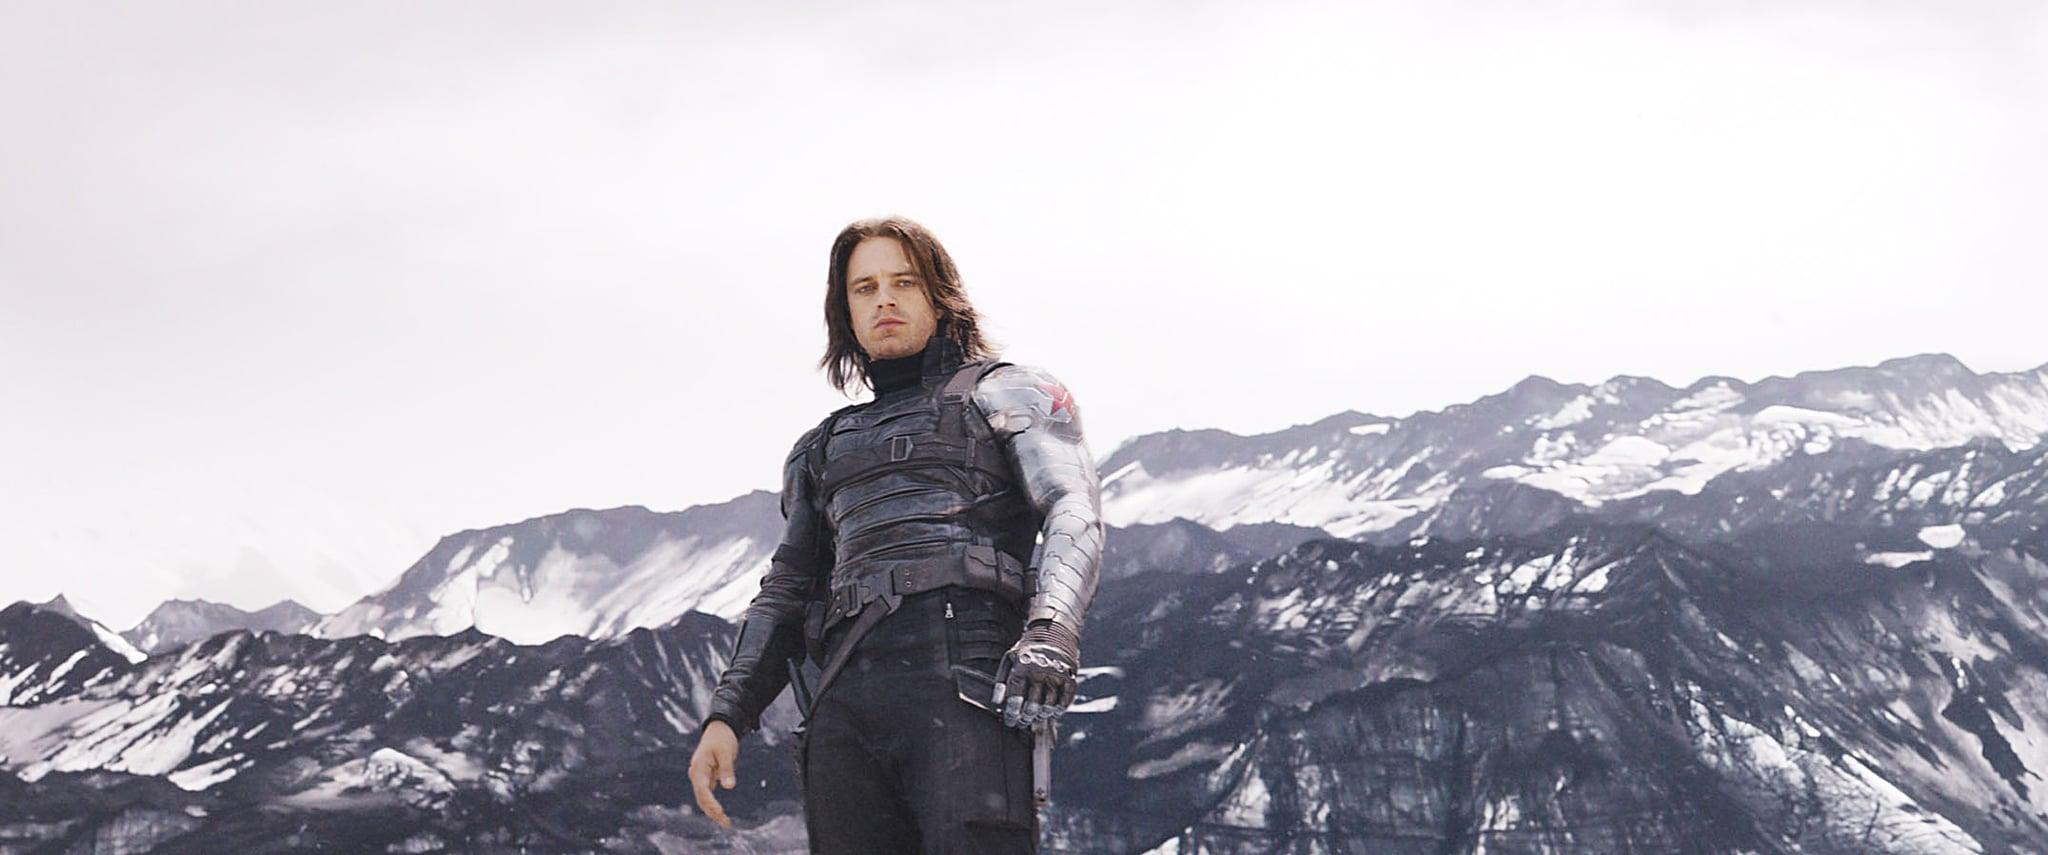 CAPTAIN AMERICA: CIVIL WAR, Sebastian Stan as Winter Soldier/Bucky Barnes, 2016. TM &  2016 Marvel. All rights reserved. /  Walt Disney Studios Motion Pictures / courtesy Everett Collection